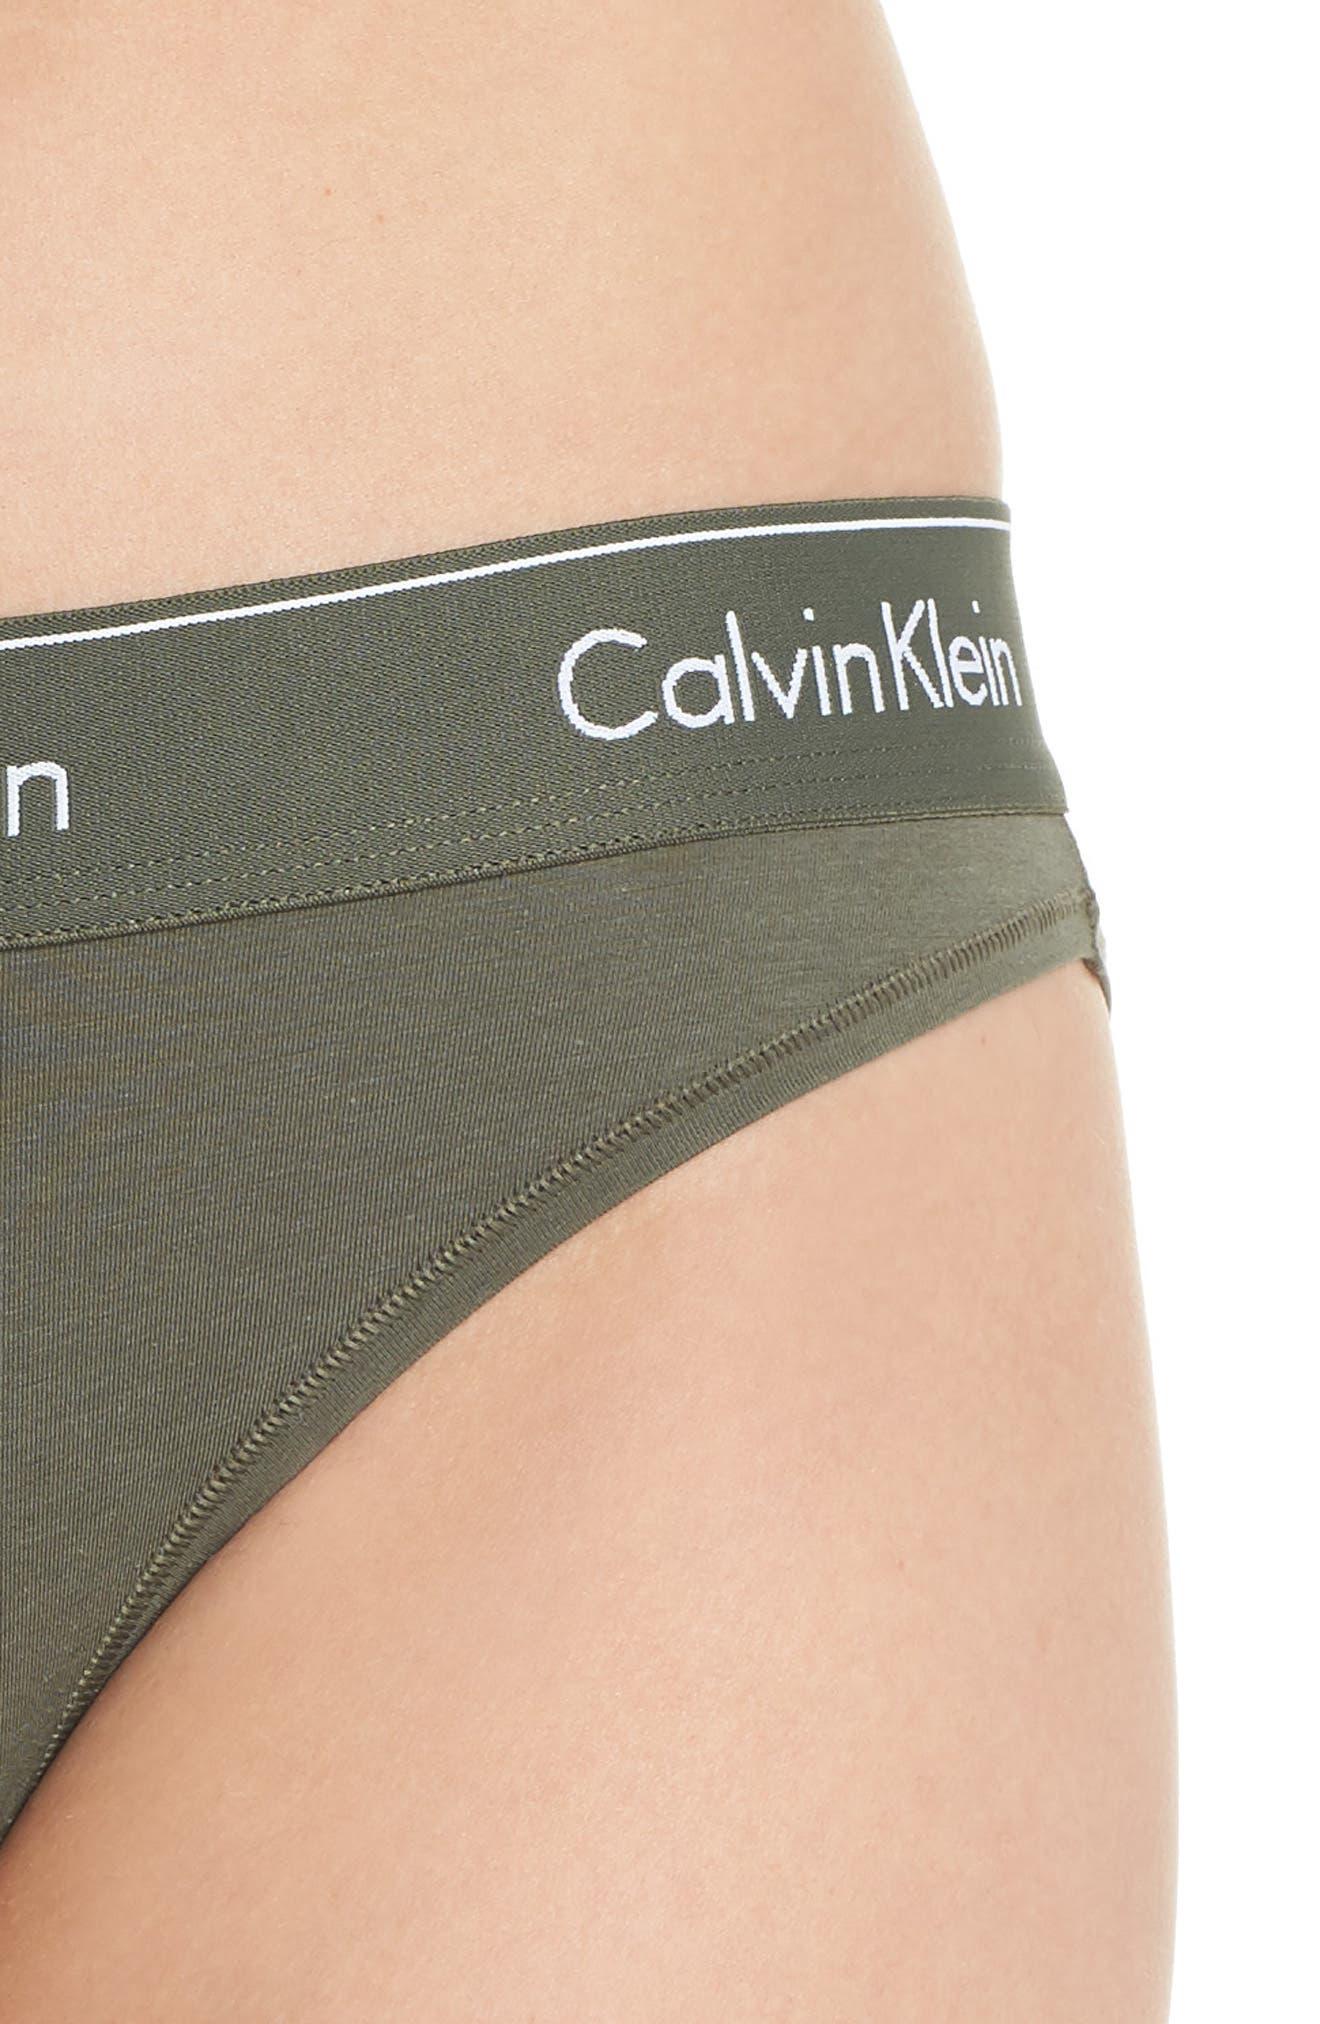 'Modern Cotton Collection' Cotton Blend Bikini,                             Alternate thumbnail 5, color,                             BEETLE